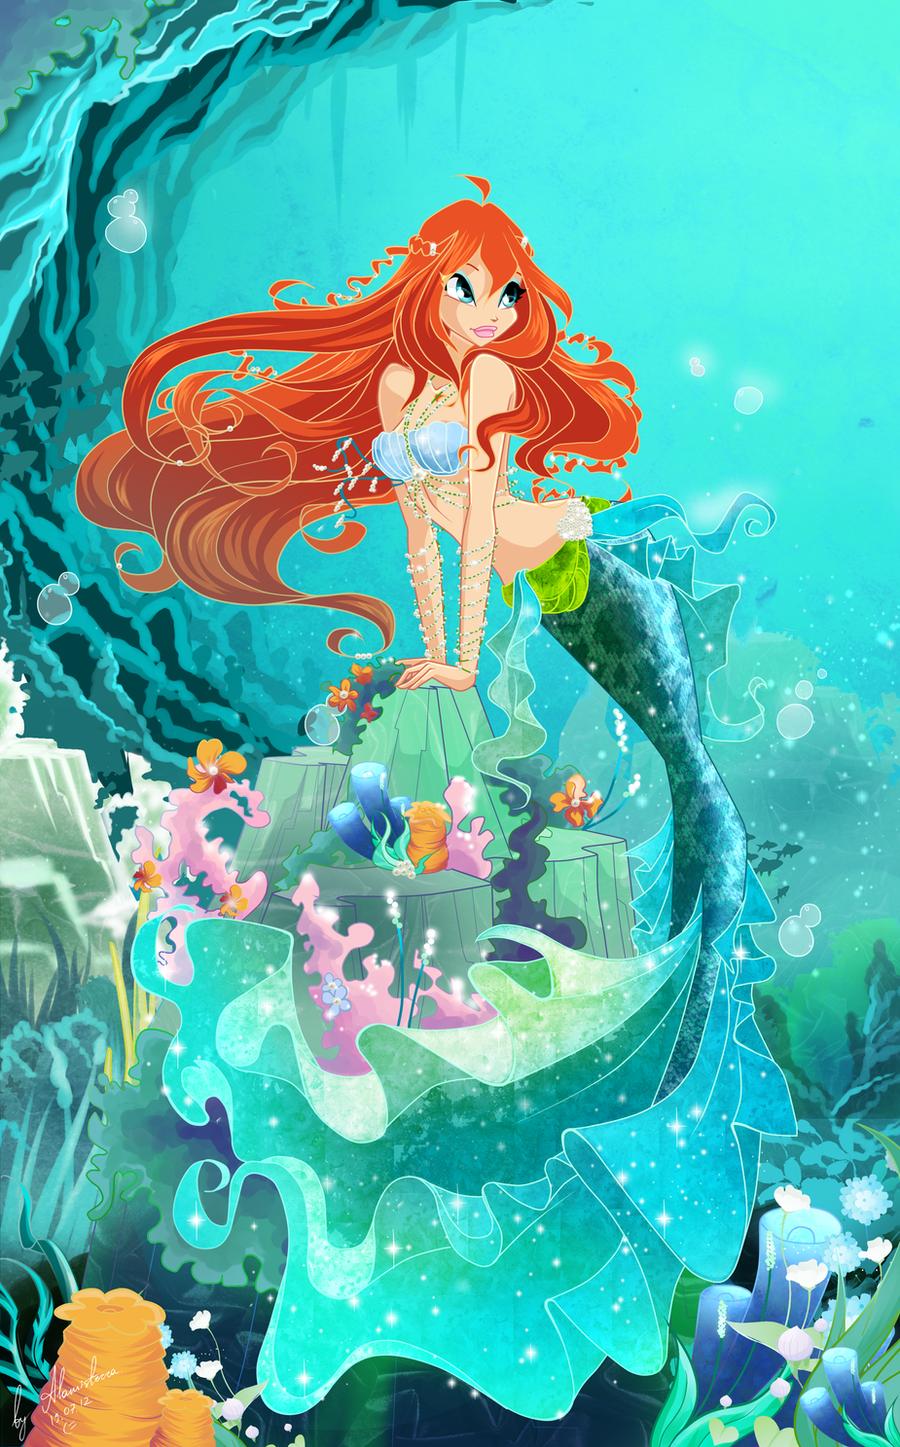 http://fc02.deviantart.net/fs70/i/2012/200/6/7/bloom_mermaid_by_alamisterra-d57t4gr.png